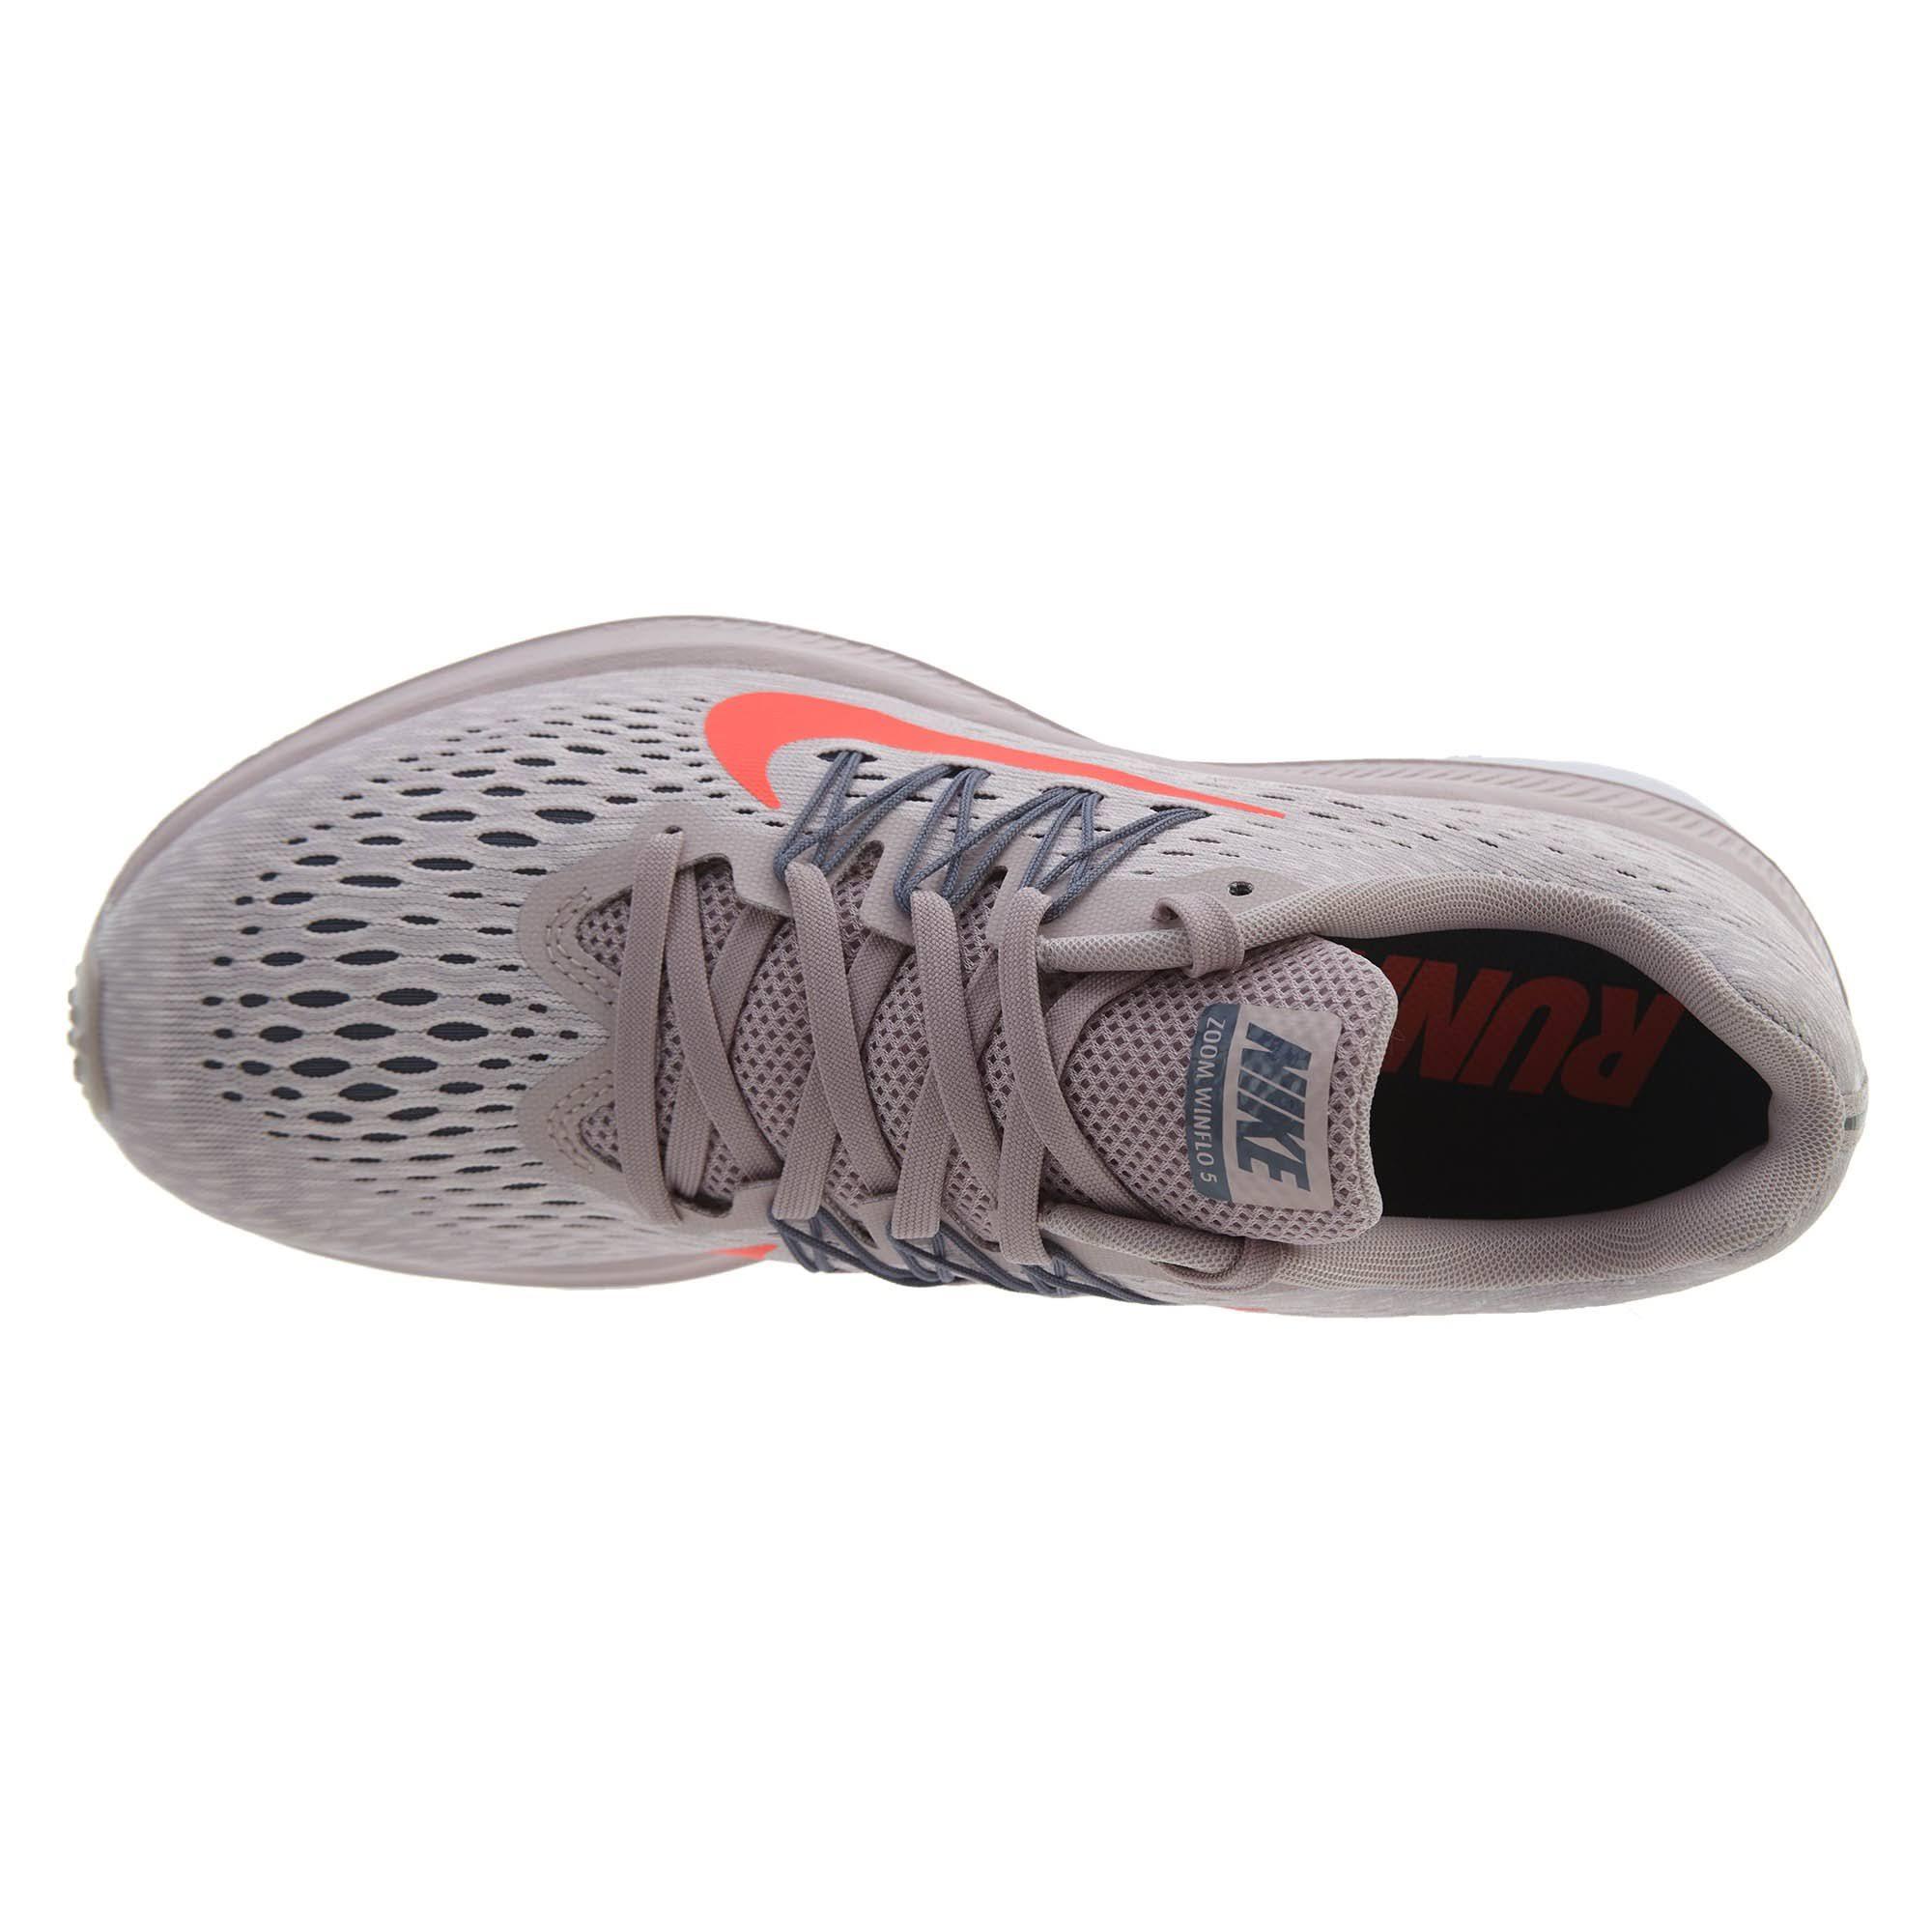 Running Winflo Tamaño Para 6 Mujer De Zoom Particle Zapatillas 5 Nike 5 Rose wf6RvOXq6